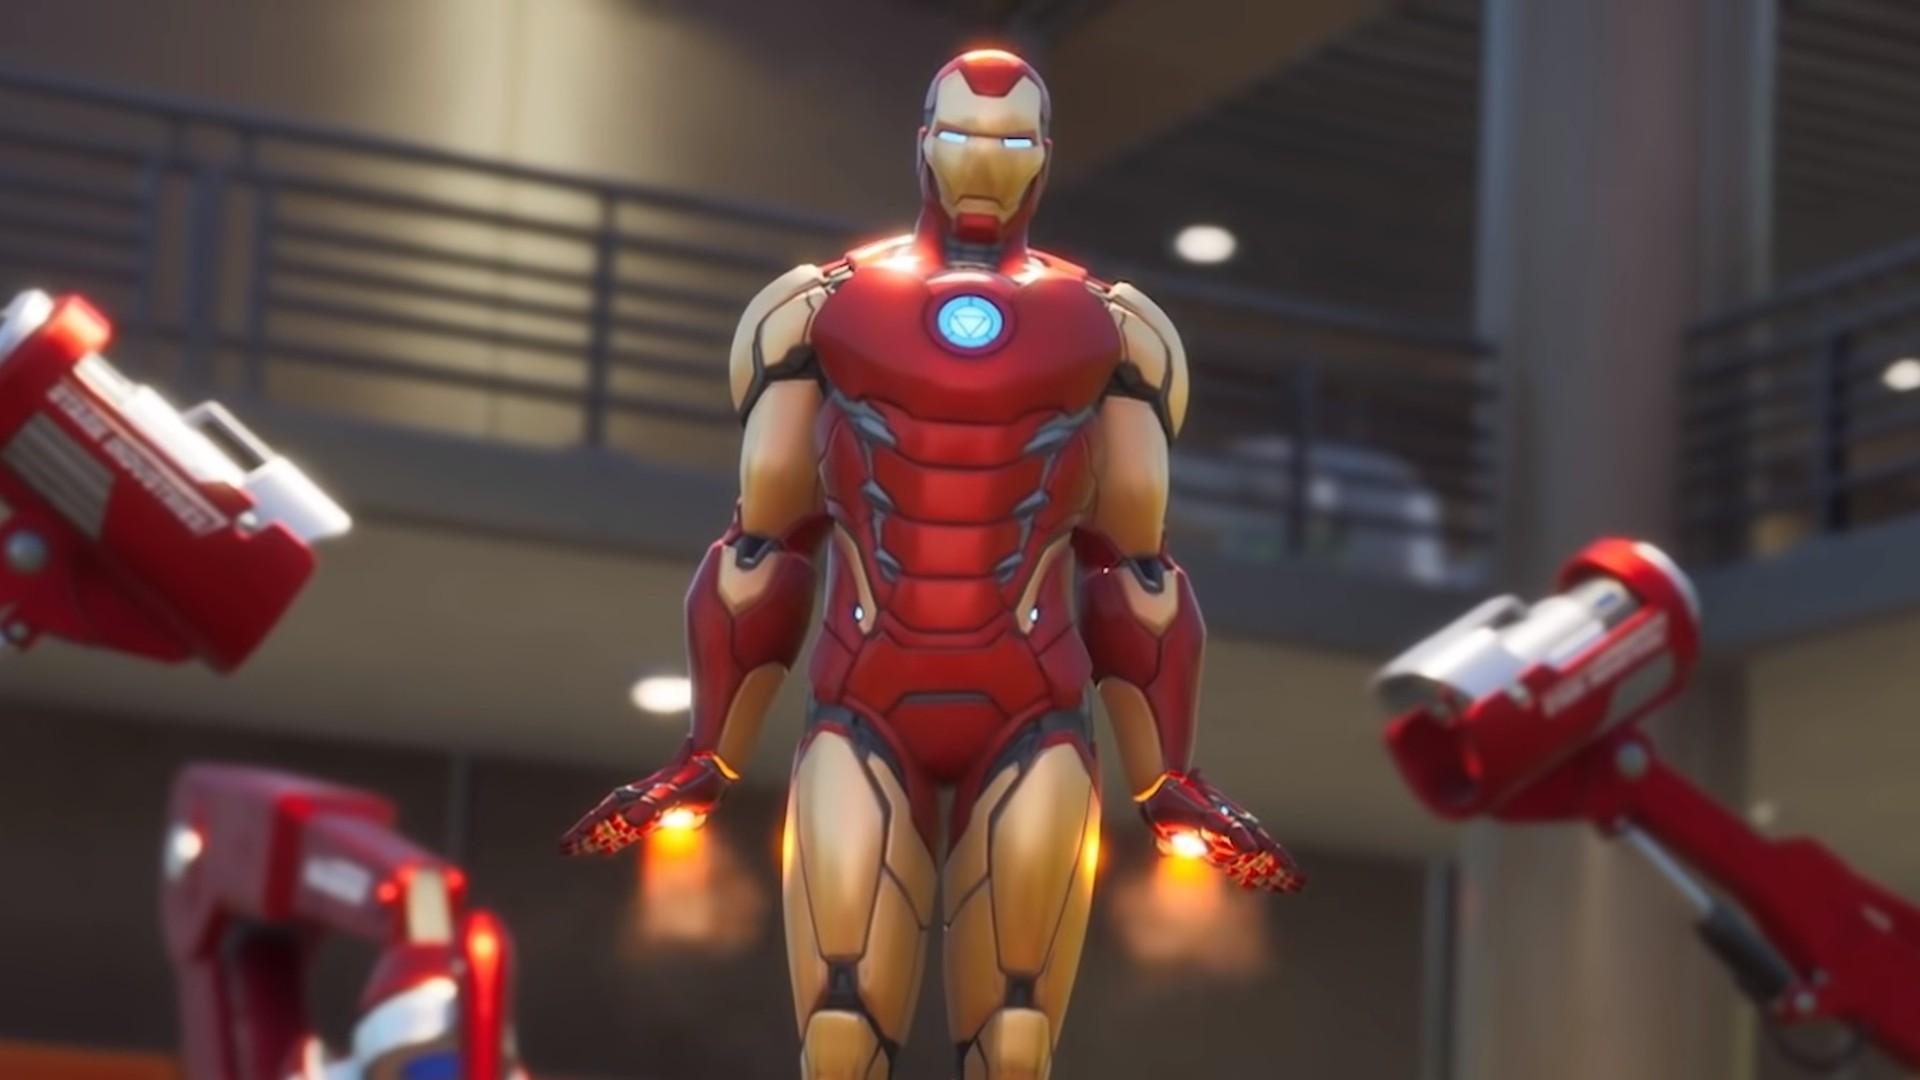 How To Complete All Tony Stark Awakening Challenges In Fortnite Pc Gamer